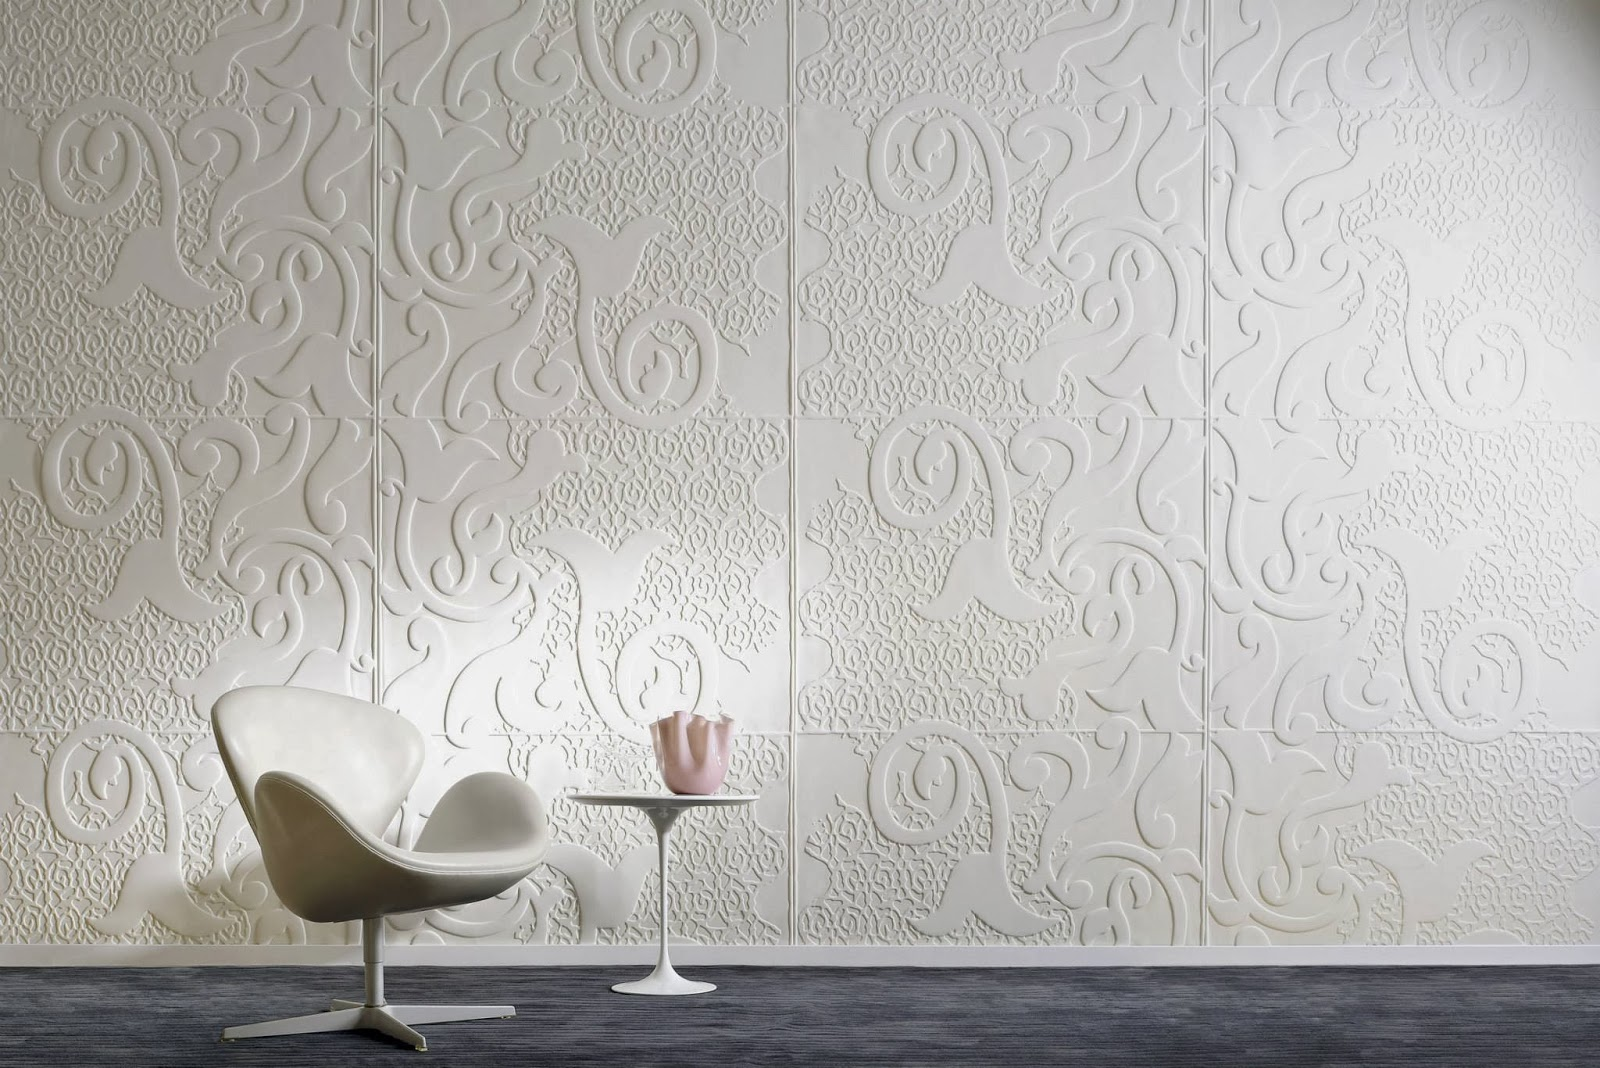 LIA Leuk Interieur Advies/Lovely Interior Advice: Élitis wallpaper